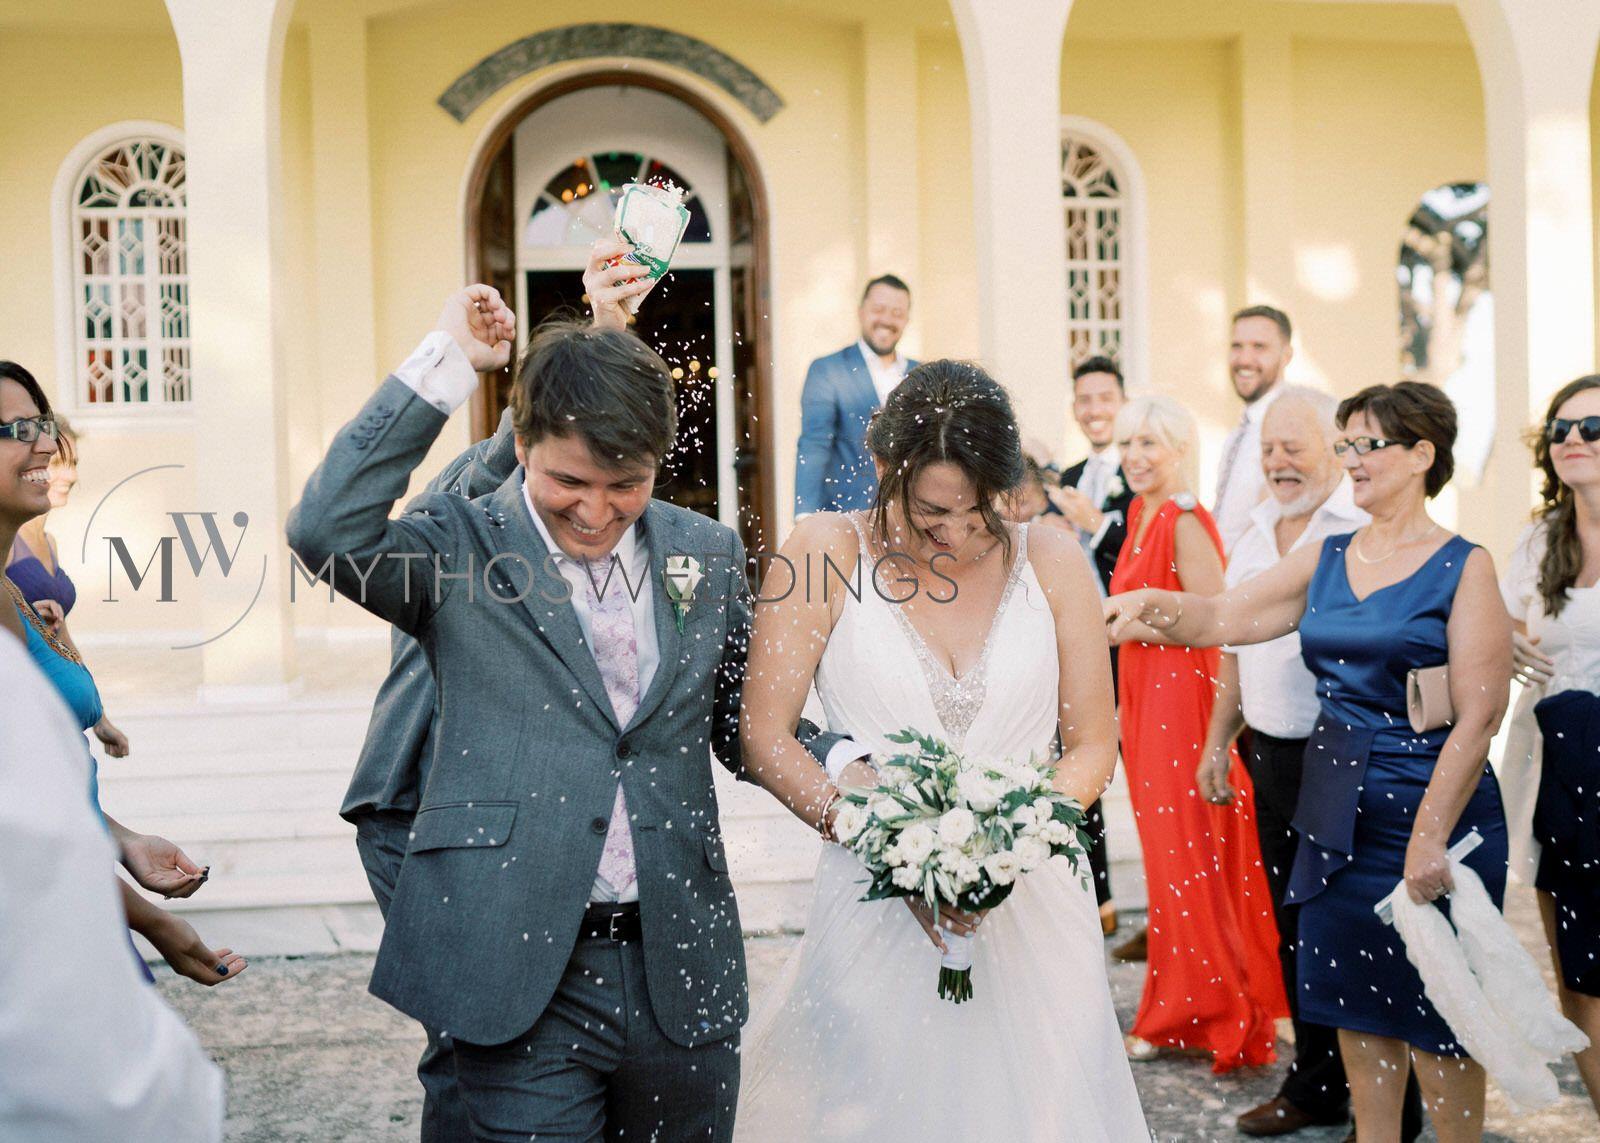 WeddingN+S08.09.18-276